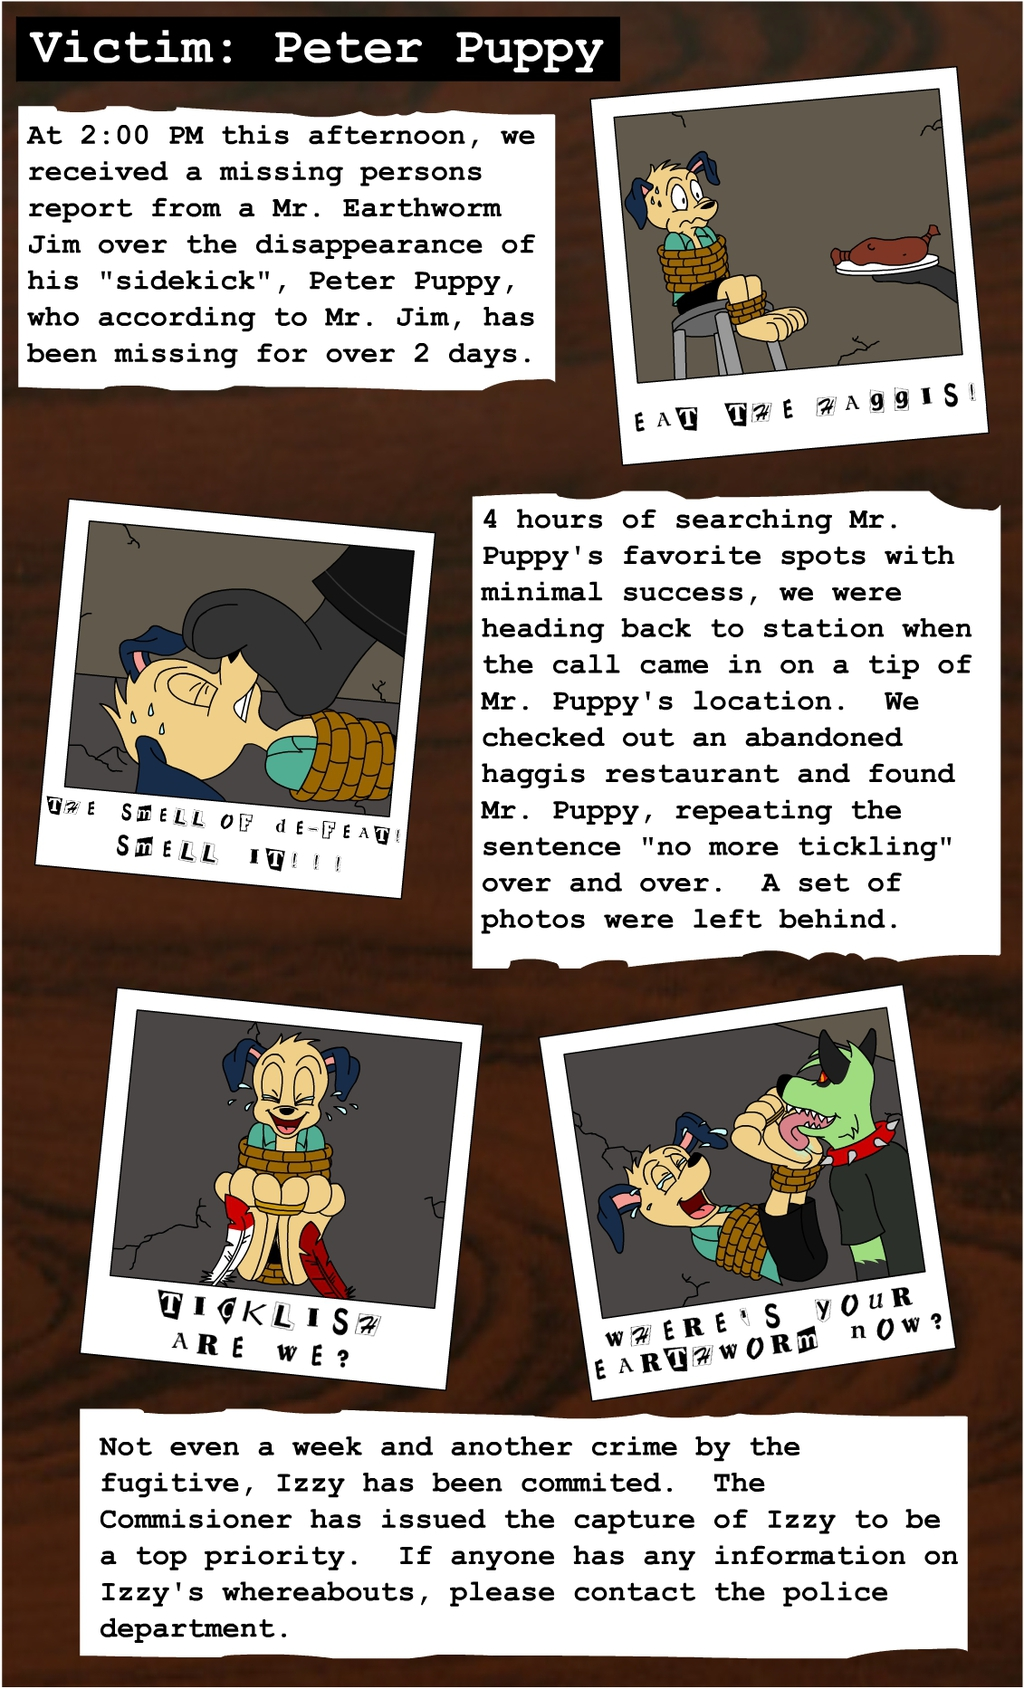 Victim 2: Peter Puppy